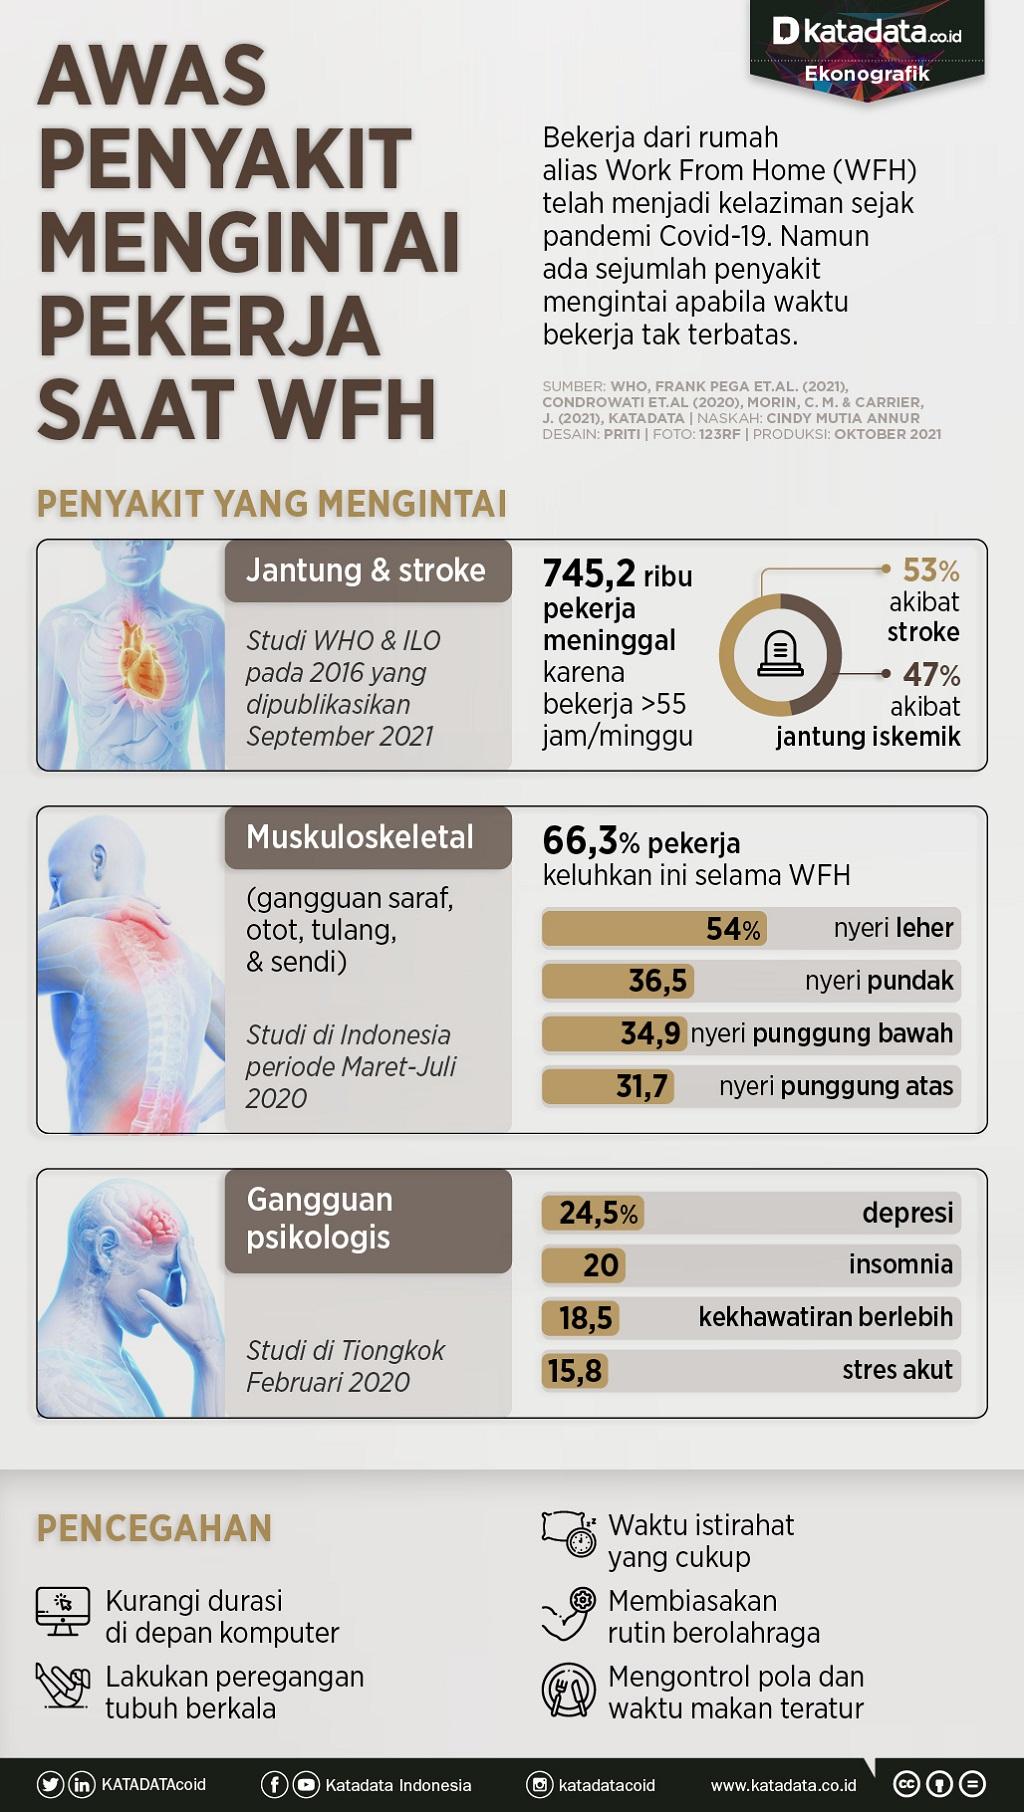 Infografik_Awas penyakit mengintai pekerja saat wfh